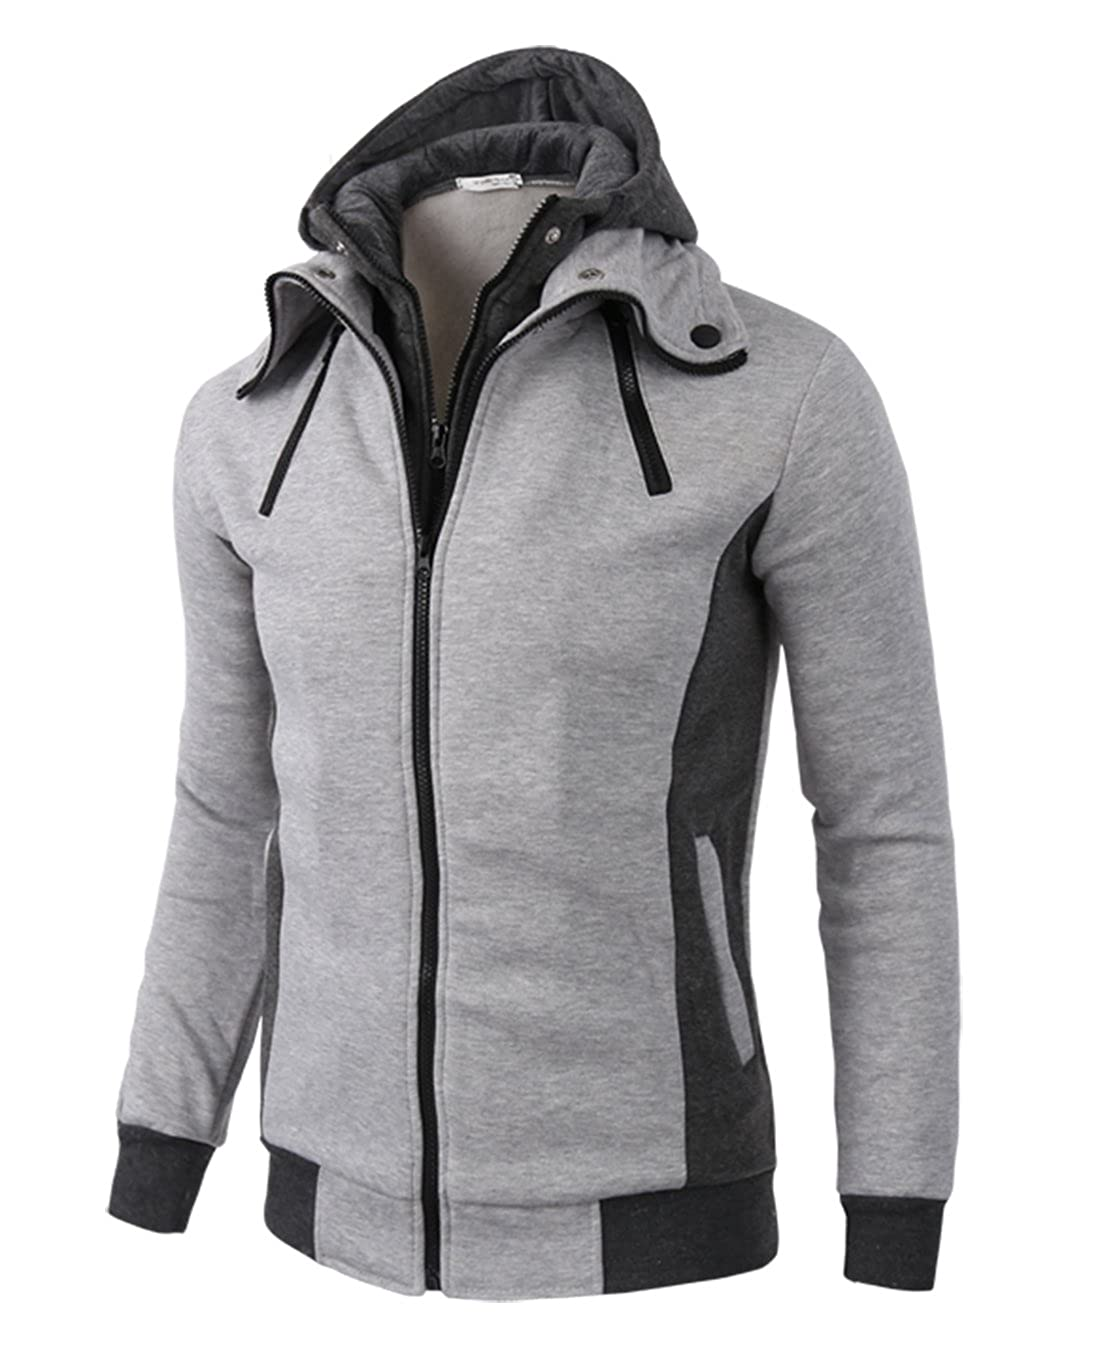 ce9e2ab12cce LOCALMODE Men s Double Zipper Hooded Jacket Turtleneck Fleece Hoodie Coat  at Amazon Men s Clothing store